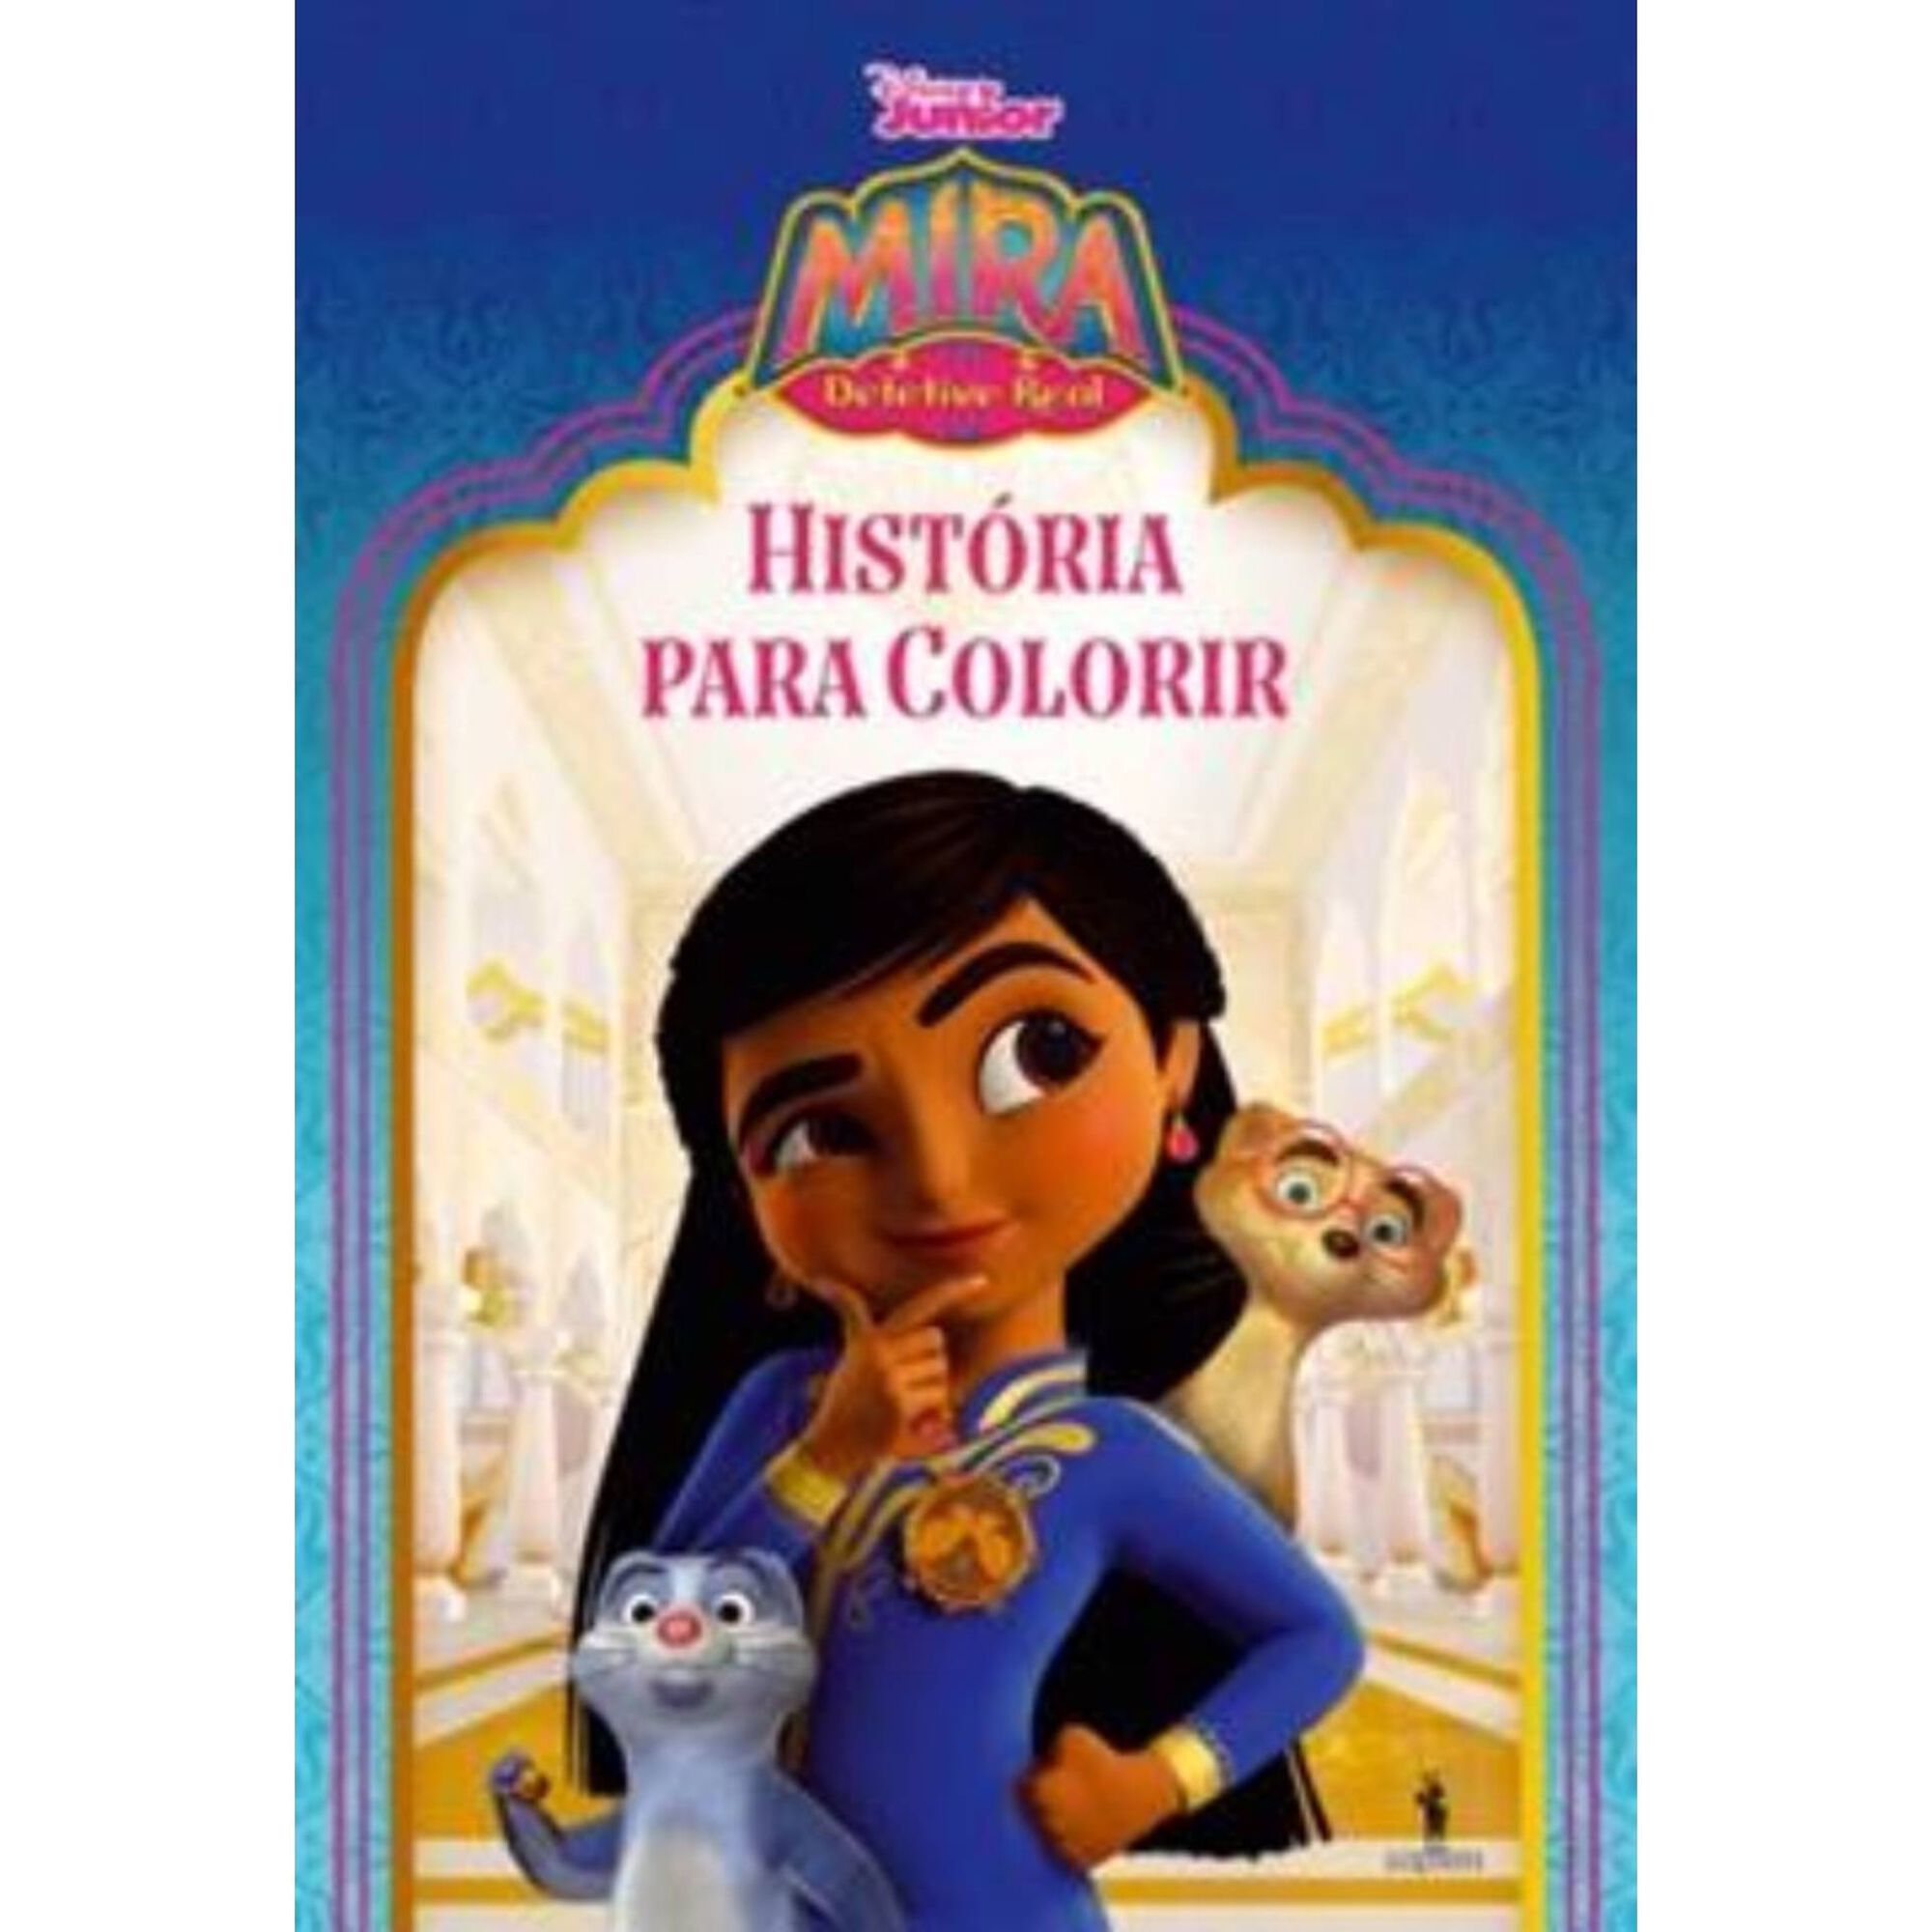 Mira - História para Colorir